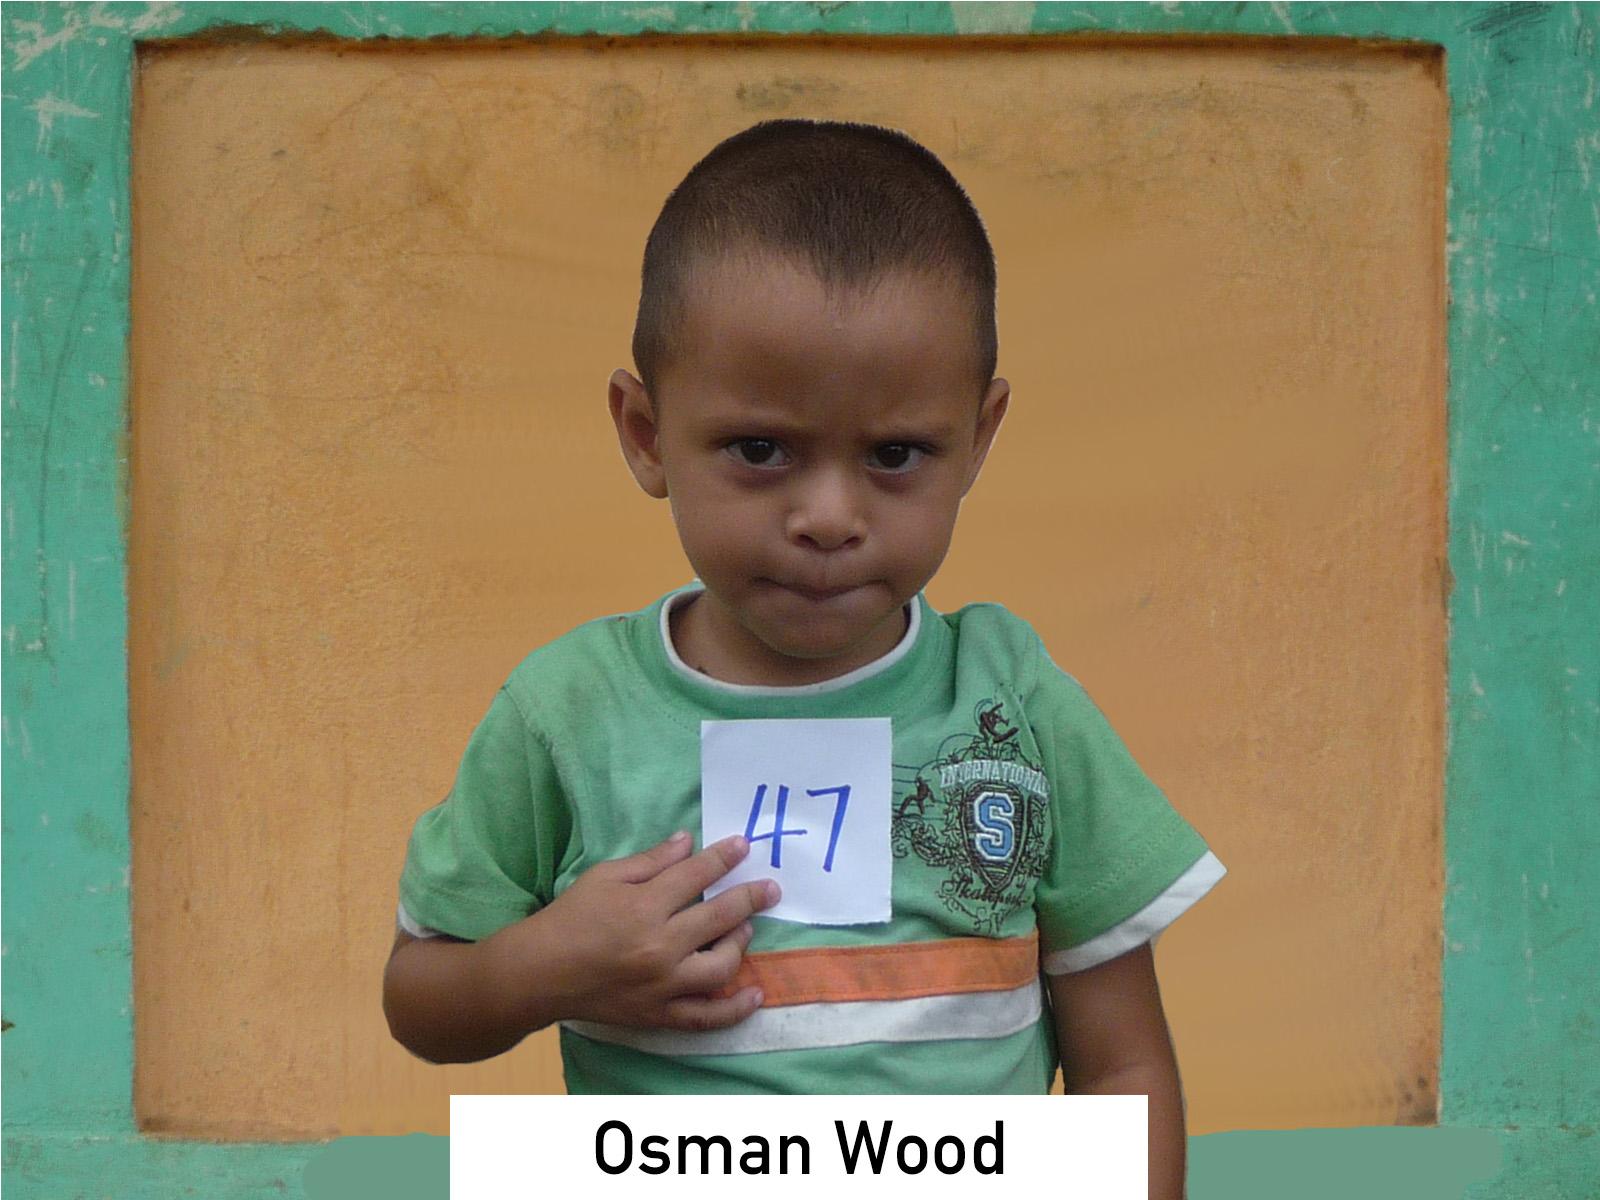 047 - Osman Wood.jpg